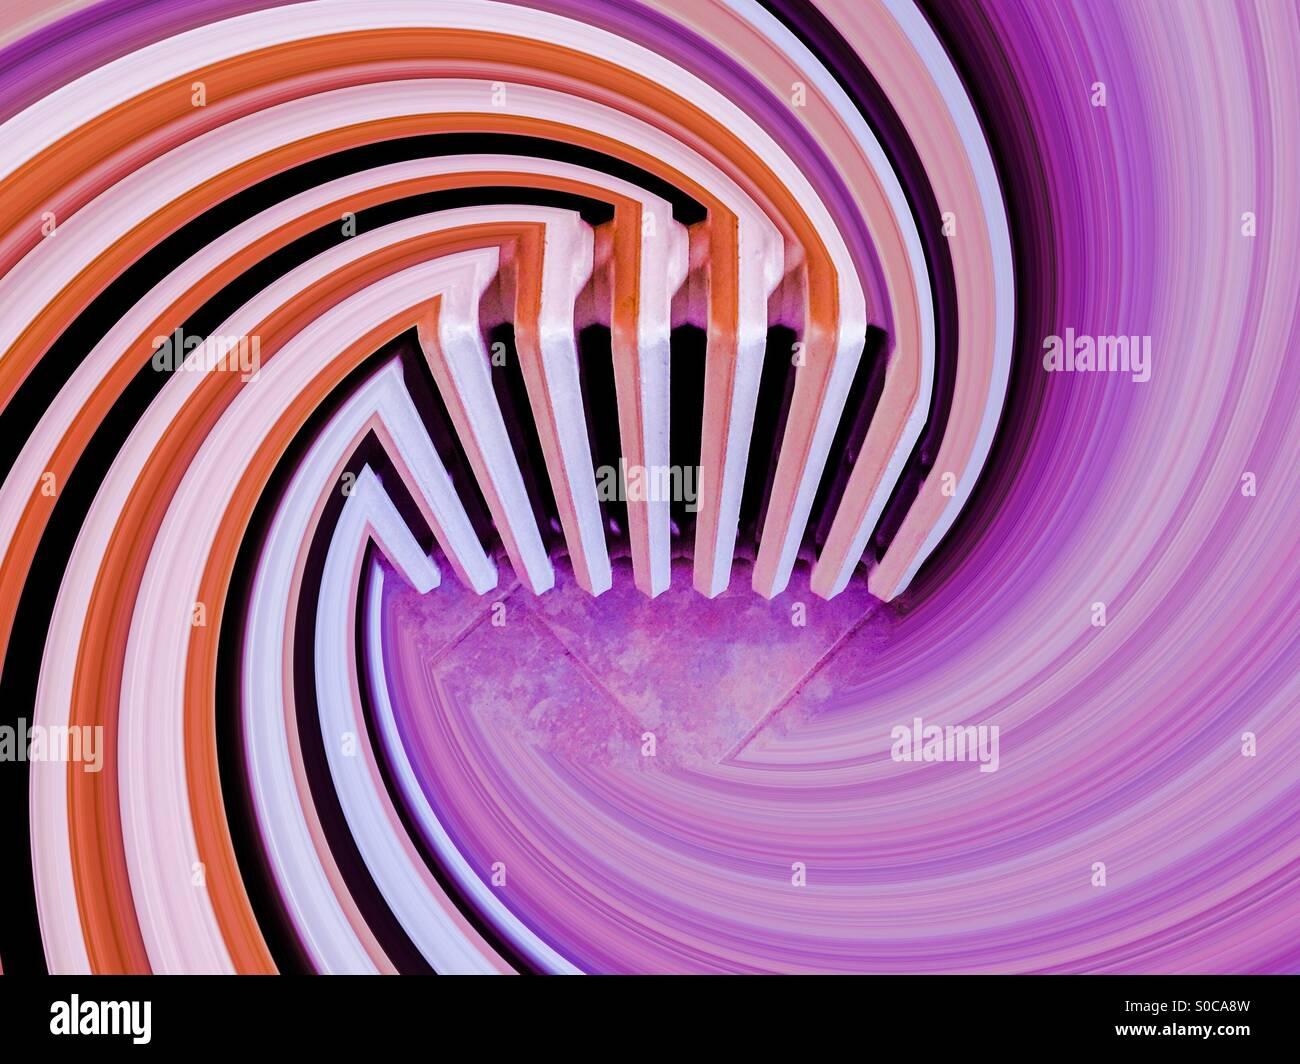 Radiator radiating - Stock Image